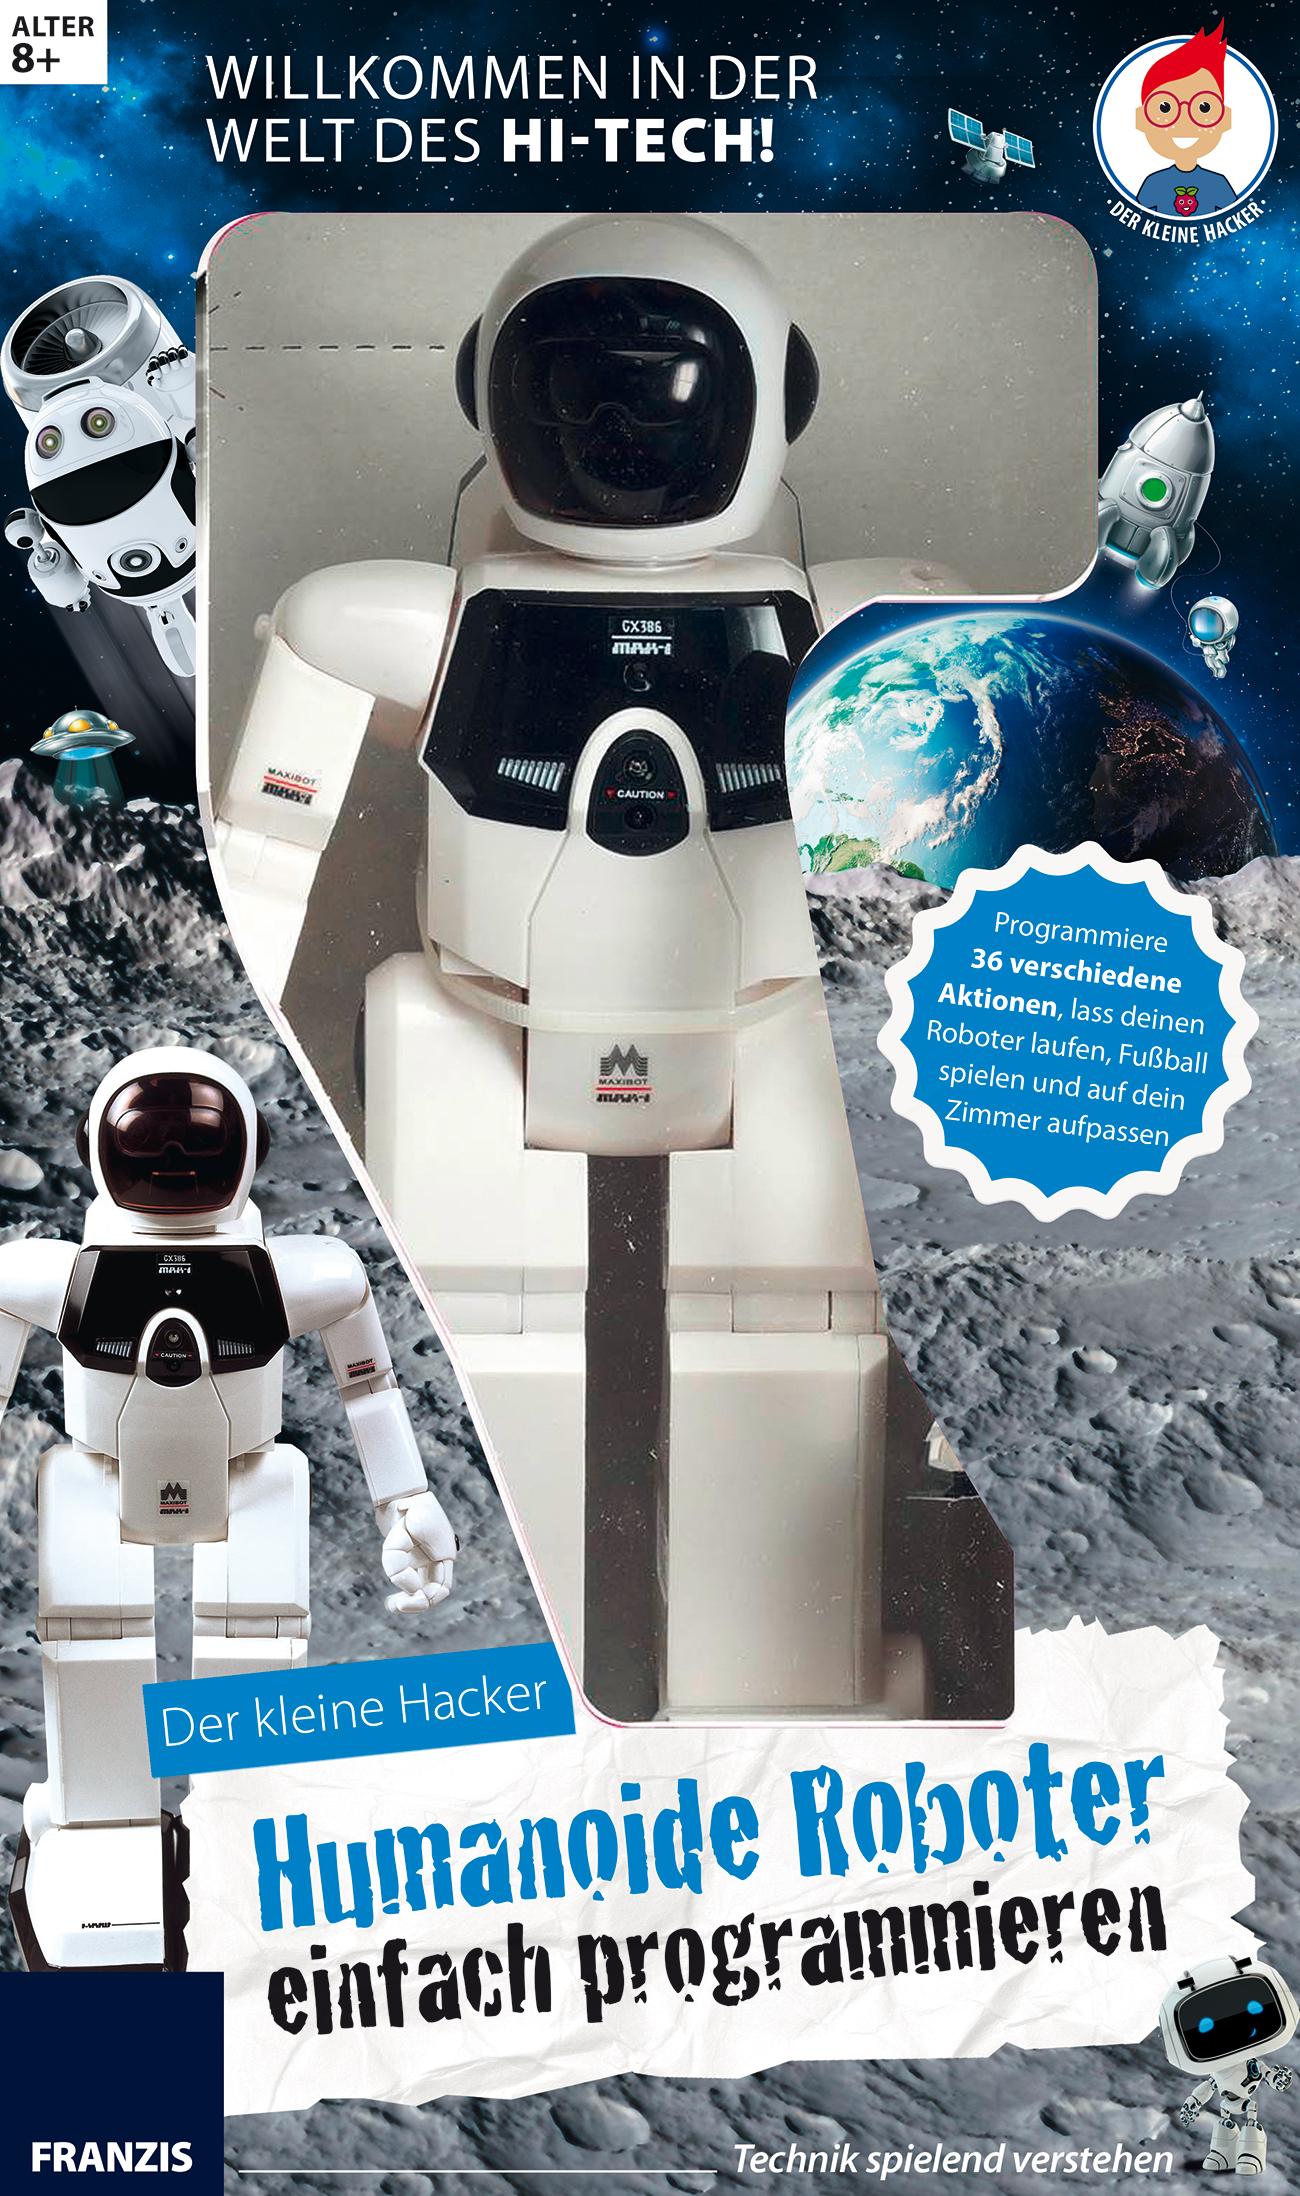 Humanoide Roboter programmieren (Technik spielend verstehen)